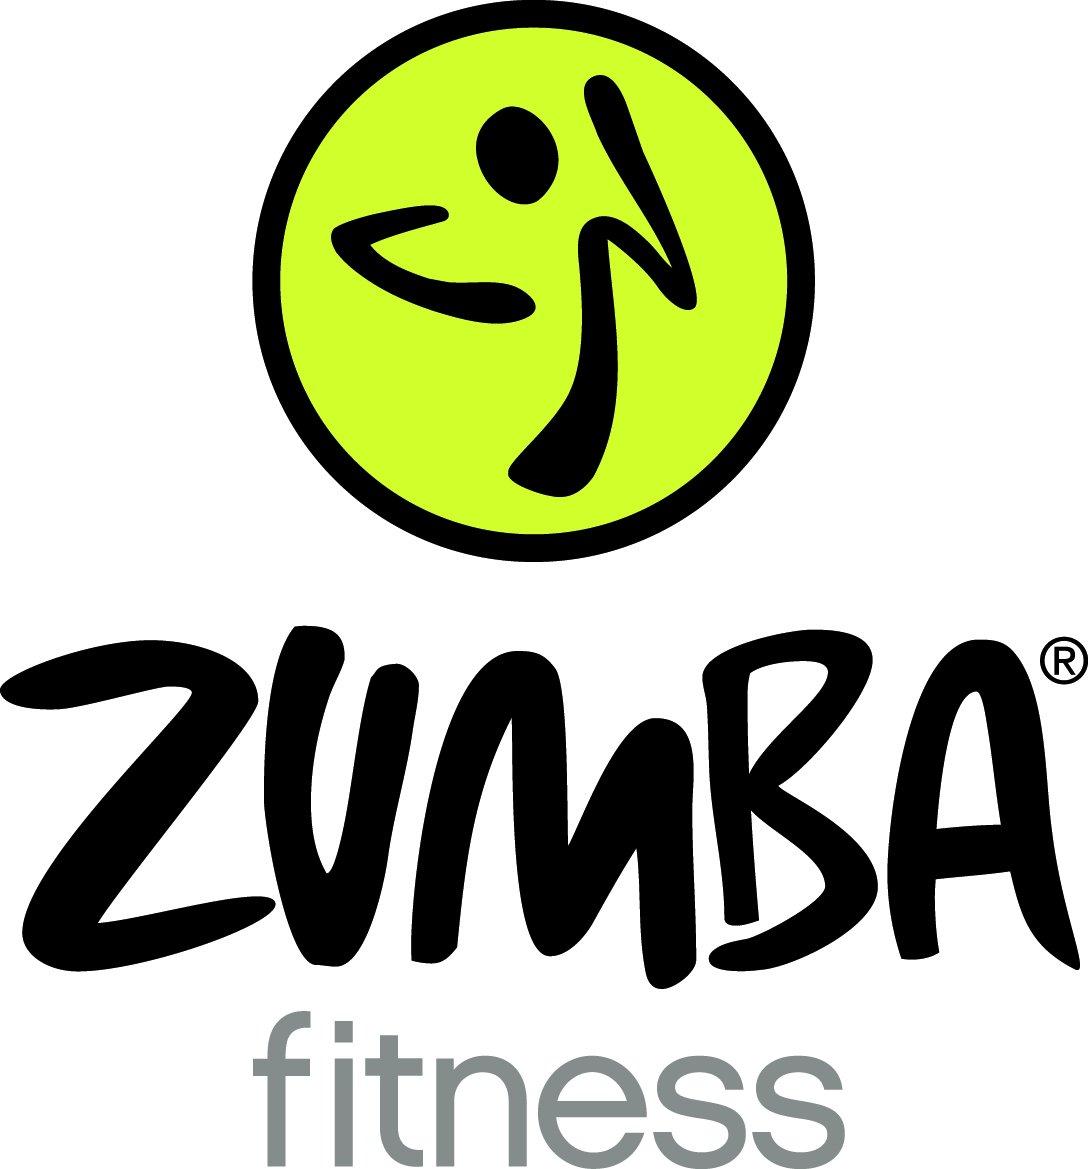 Zumba Fitness® - Pack Fitness con Mancuernas: Amazon.es: Deportes y aire libre